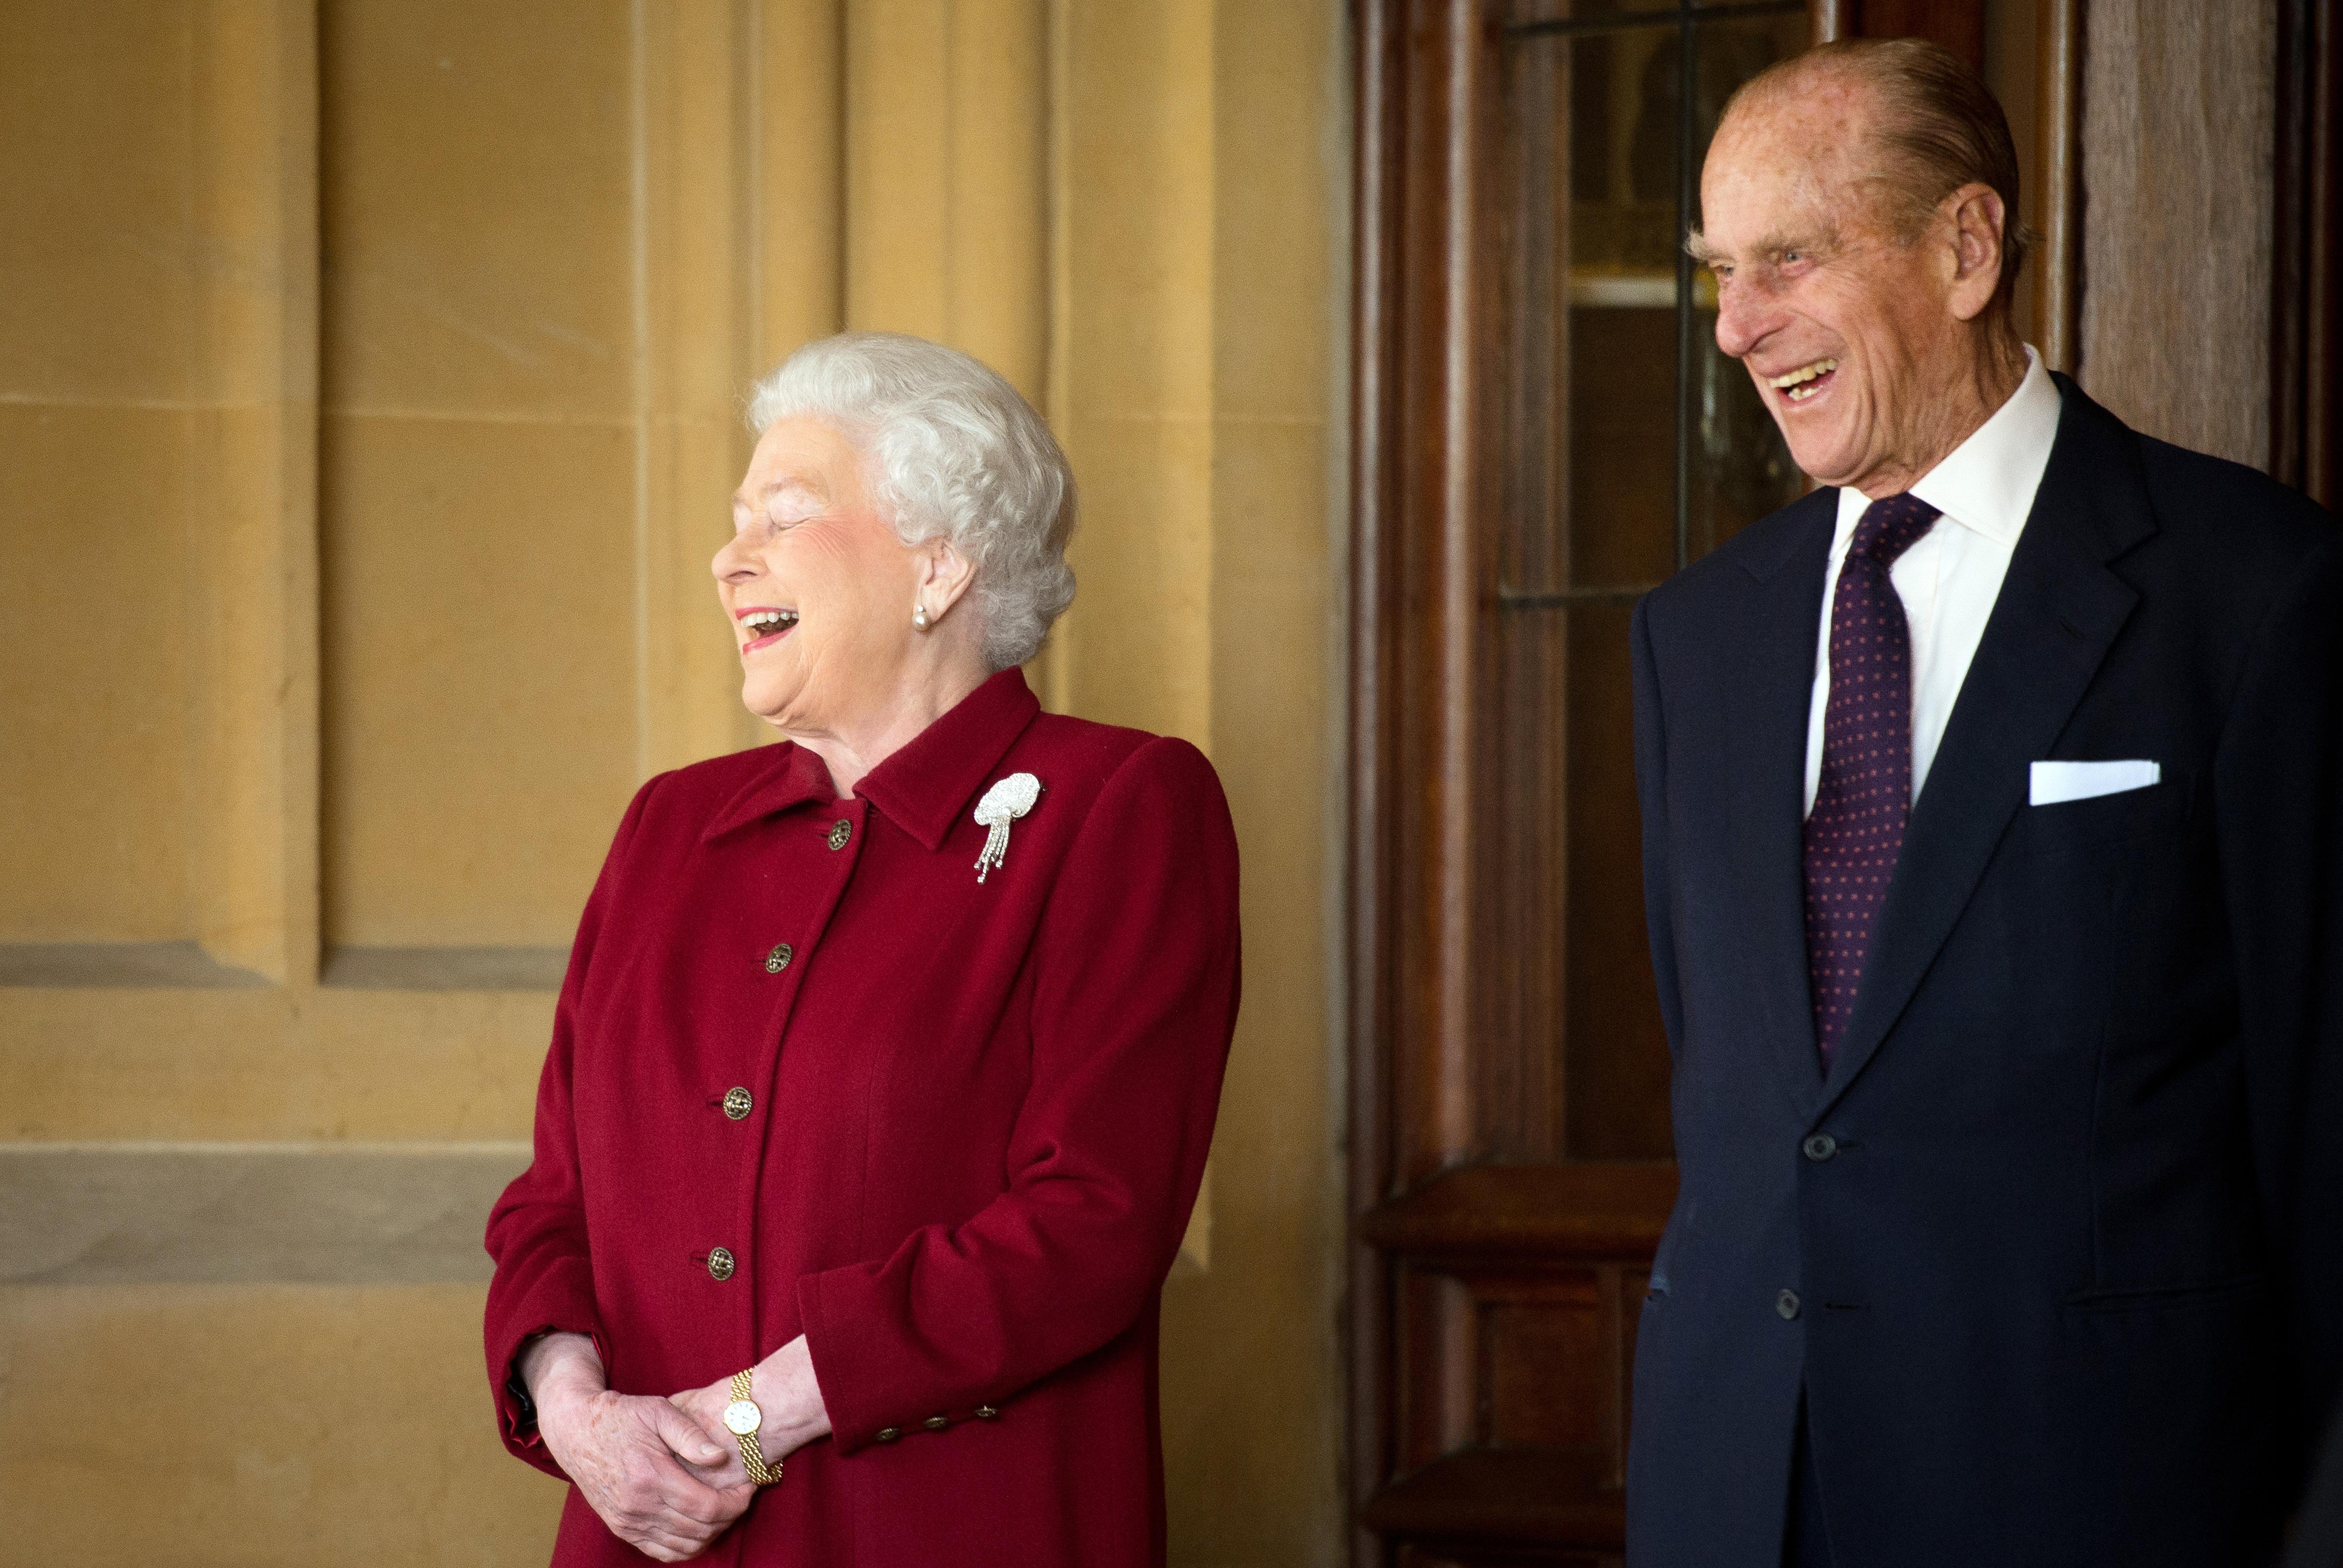 Queen Elizabeth Prince Philip Laugh Getty Images